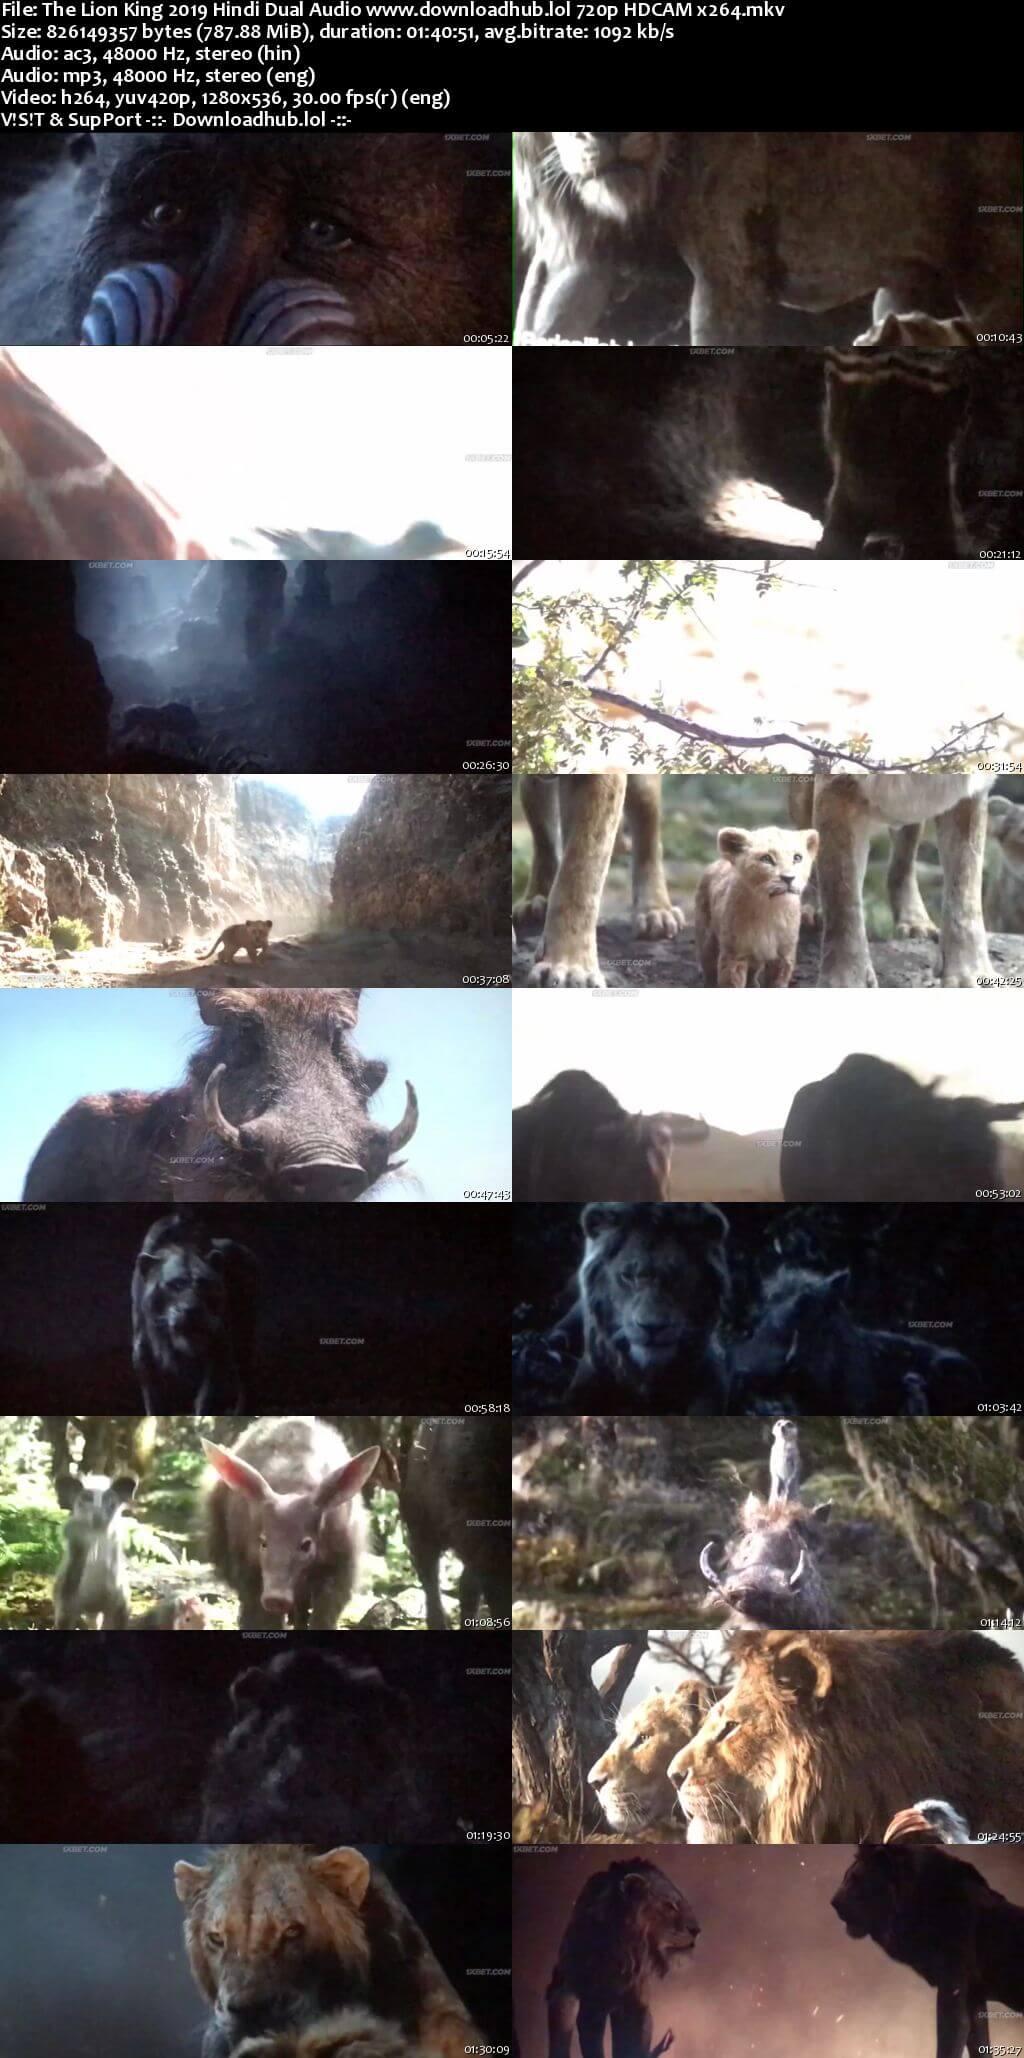 The Lion King 2019 Hindi Dual Audio 720p HDCAM x264